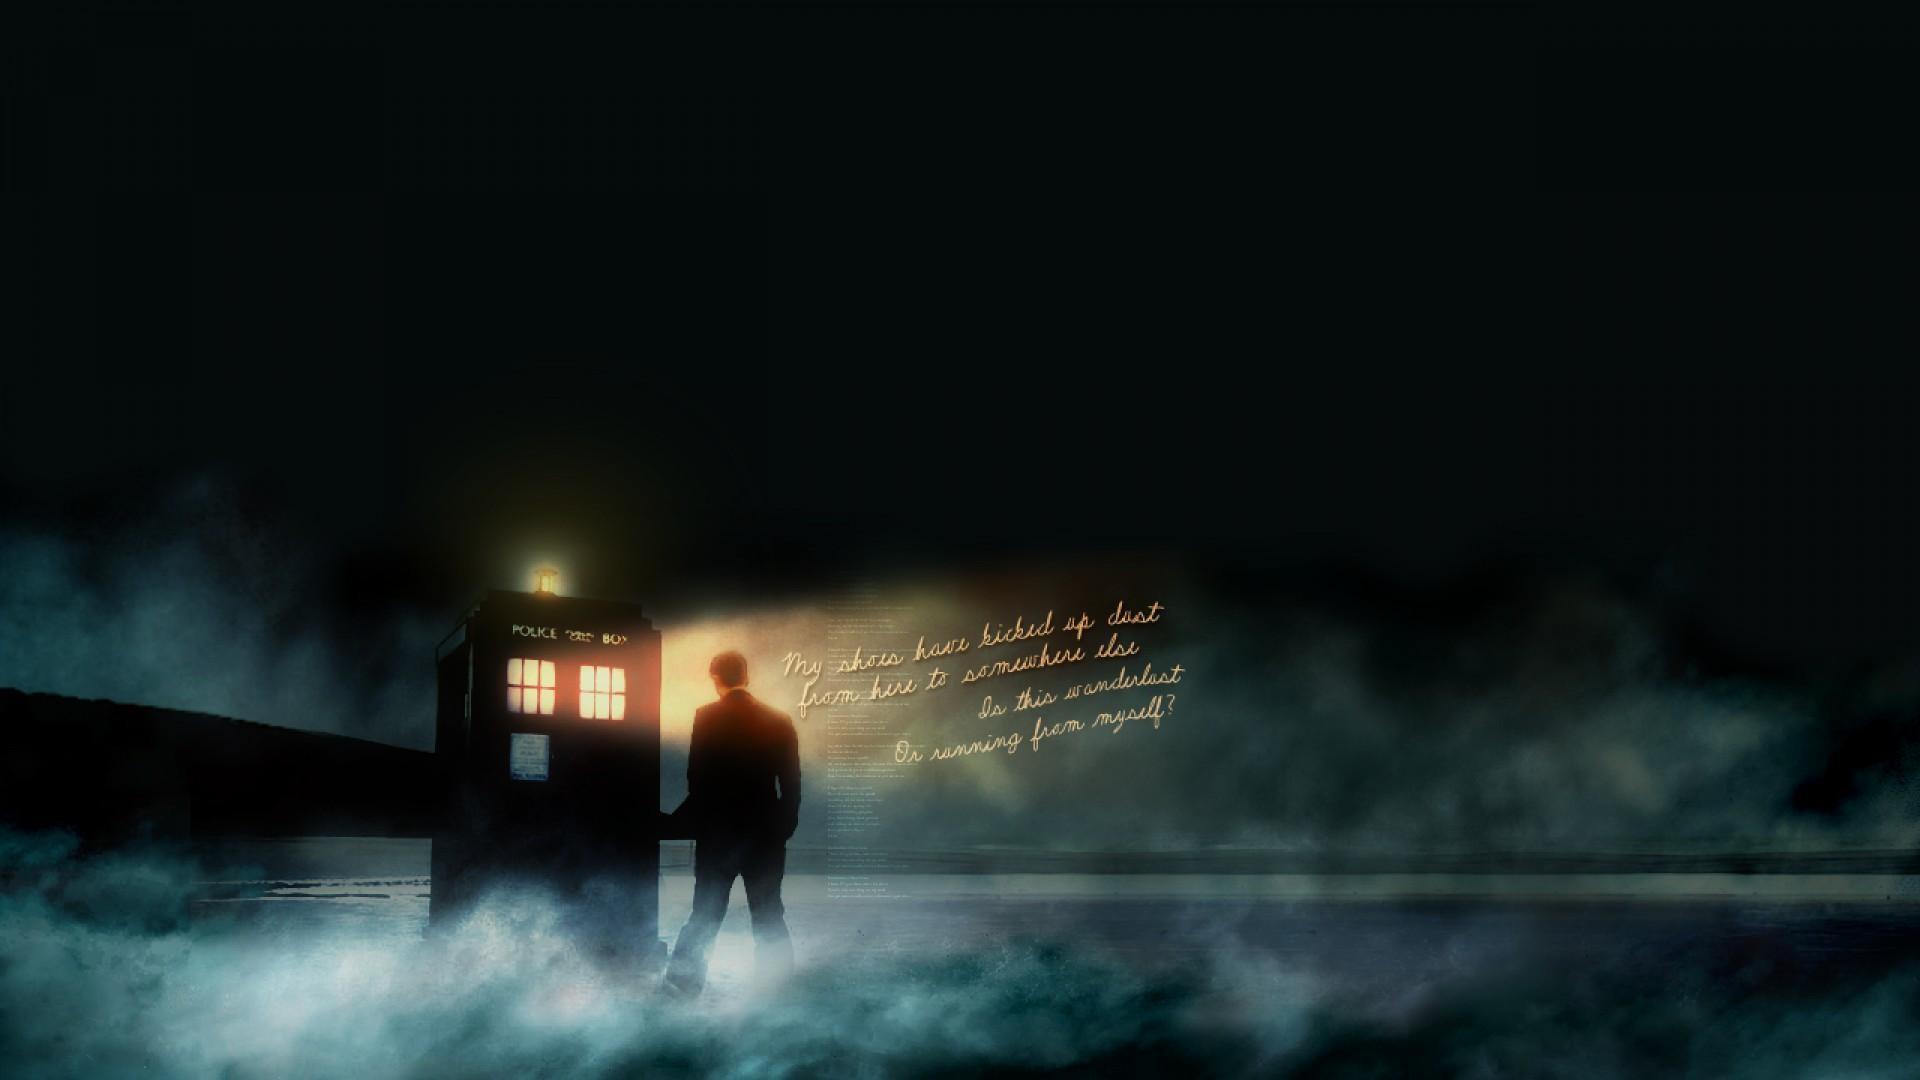 HD-Doctor-Who-Photo